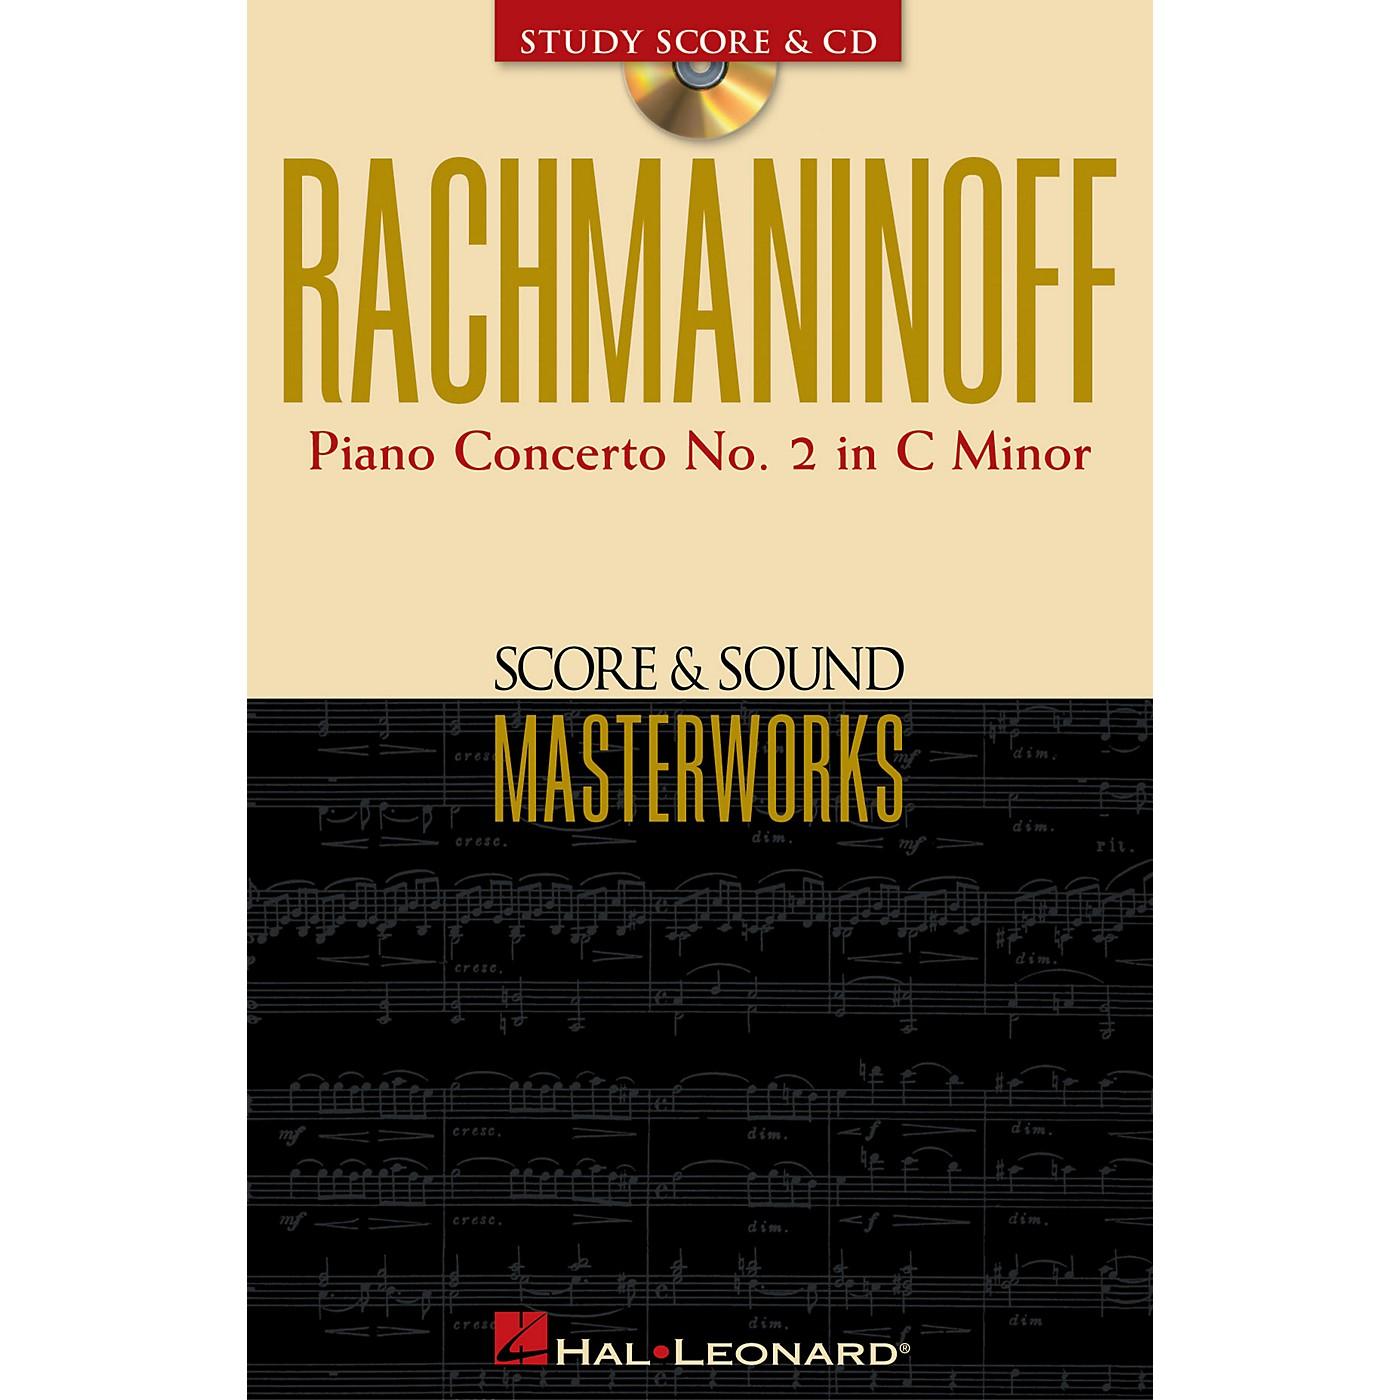 Hal Leonard Rachmaninoff - Piano Concerto No. 2 in C Minor Study Score with CD by Sergei Rachmaninoff thumbnail